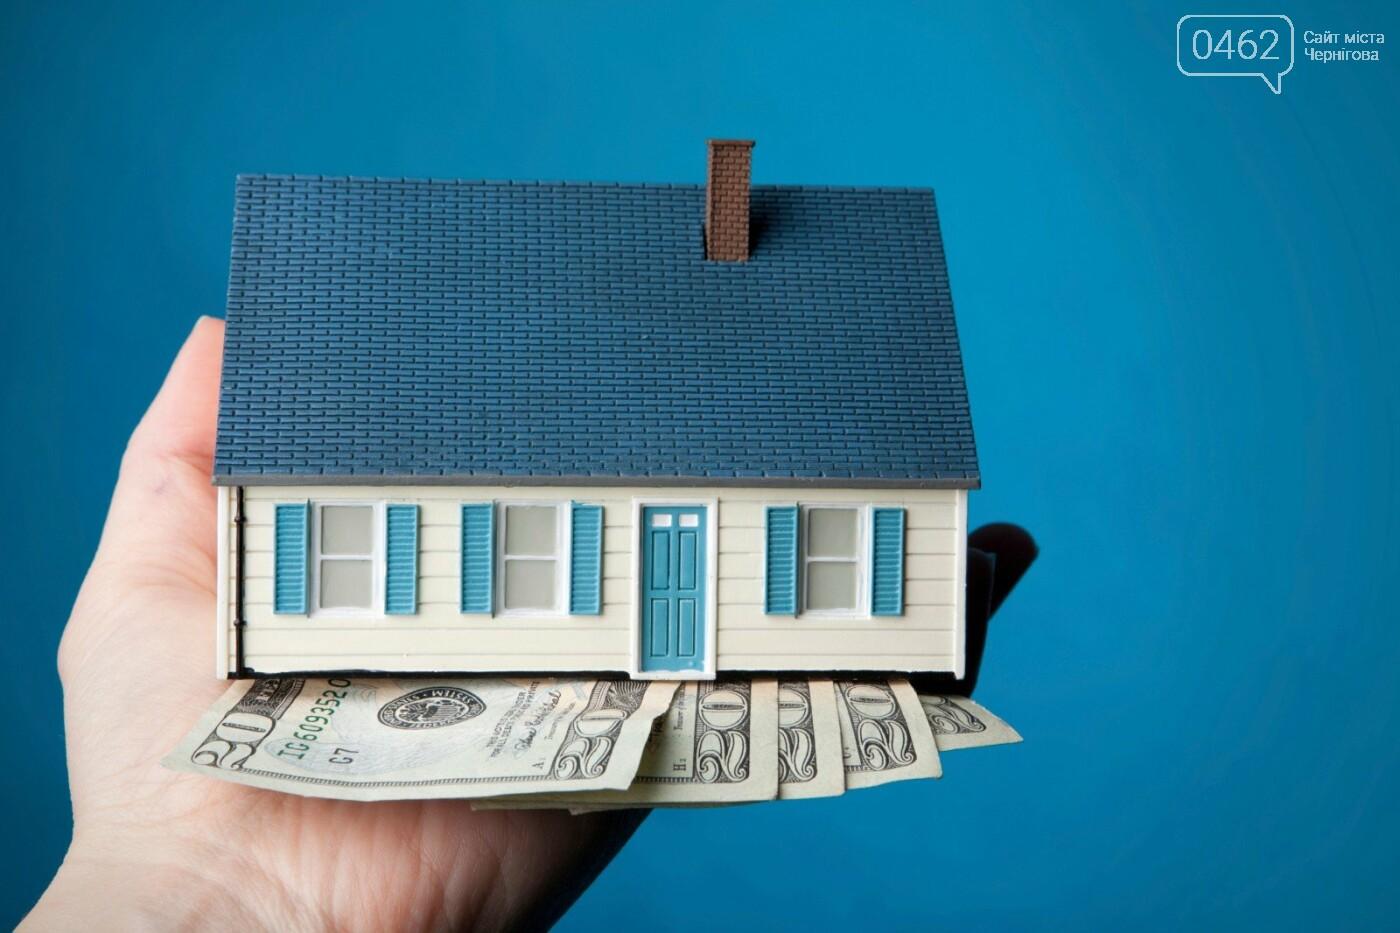 Кредиты под залог недвижимости в Чернигове